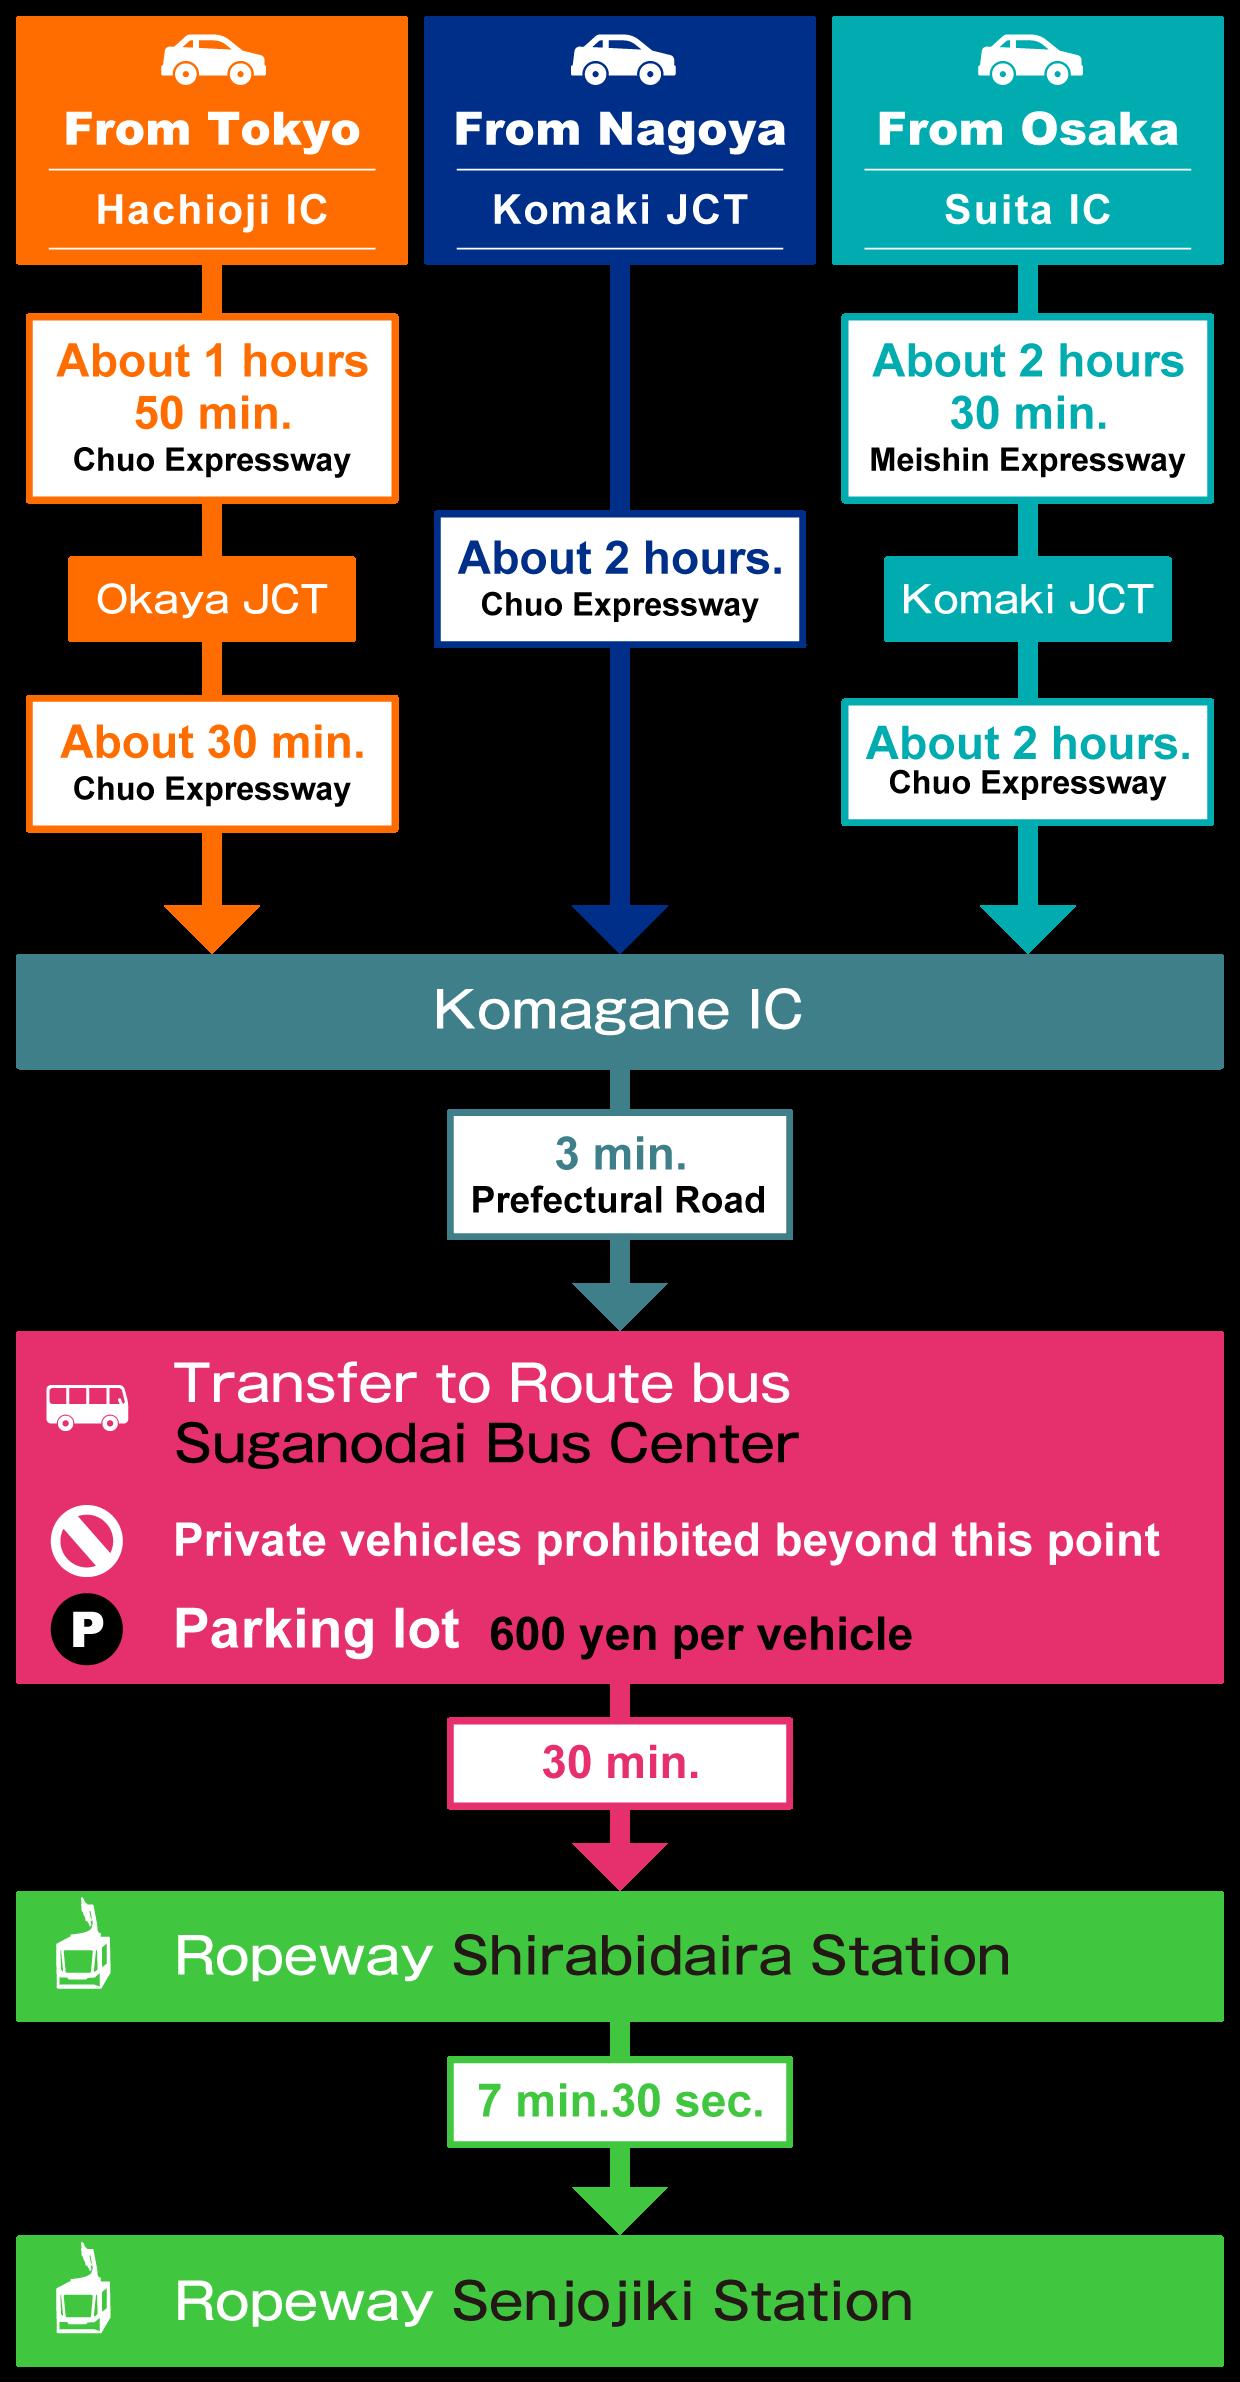 access-car-1-1-2